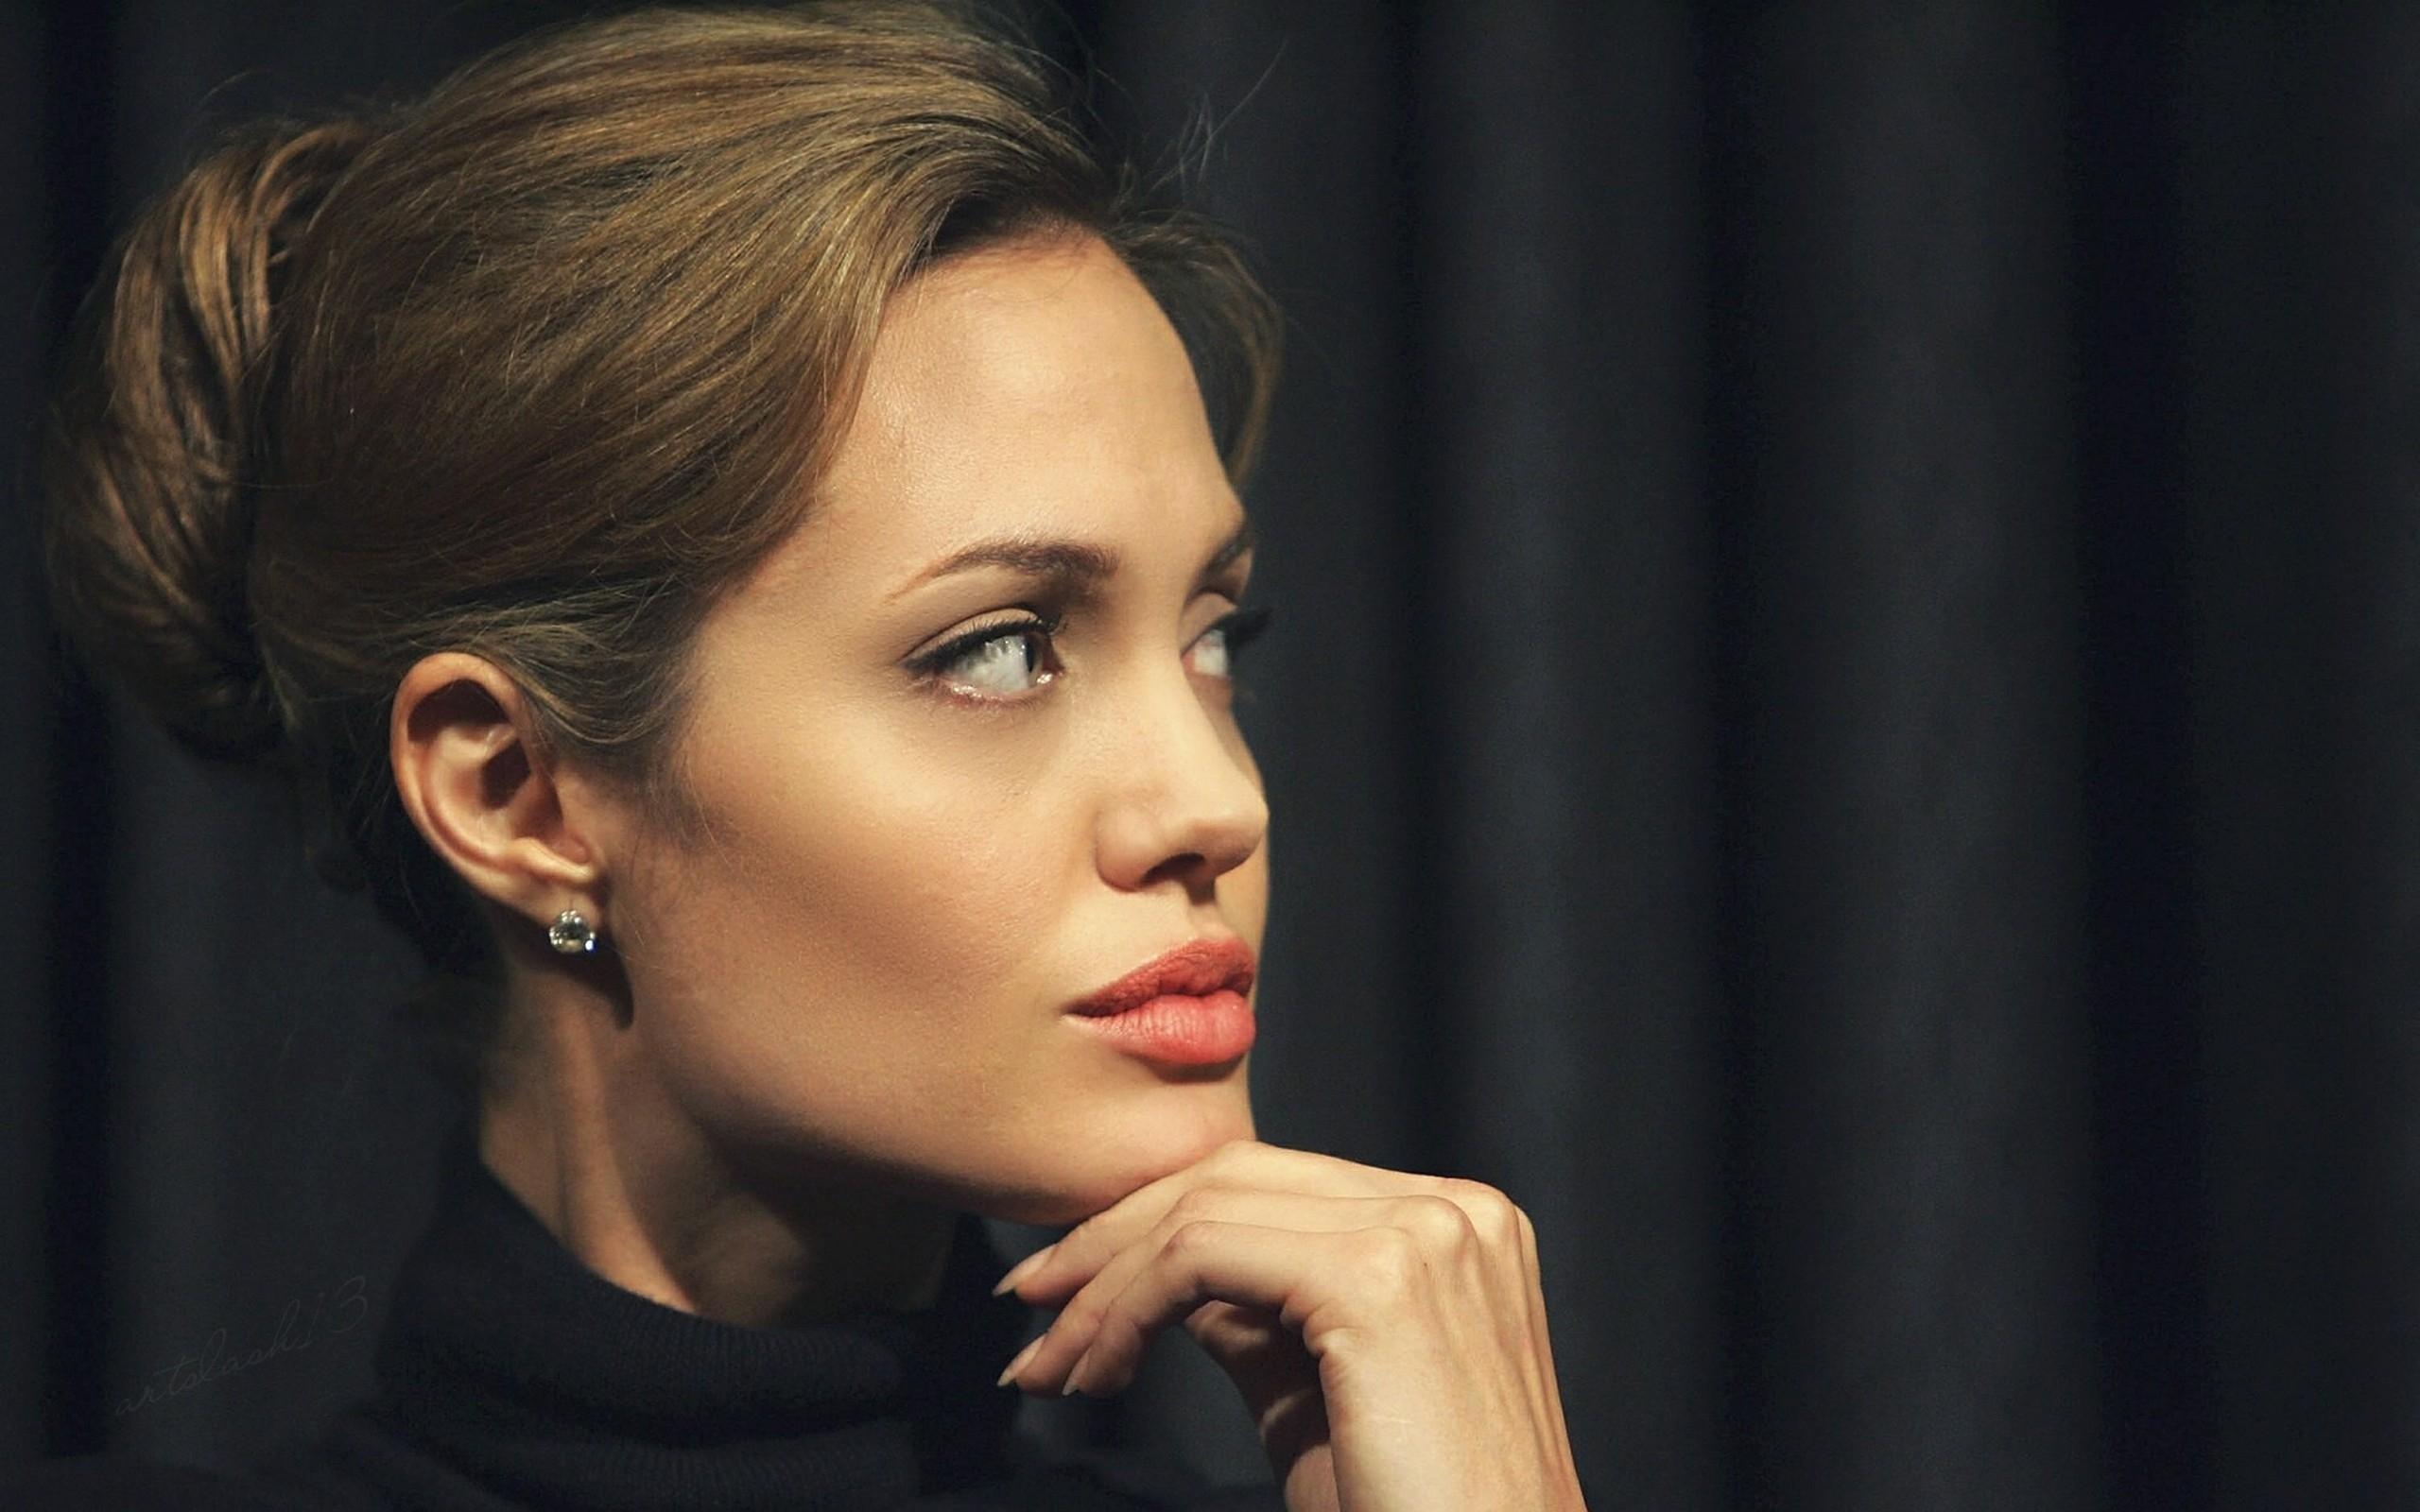 wallpaper : angelina jolie, face, eyes, actress 2560x1600